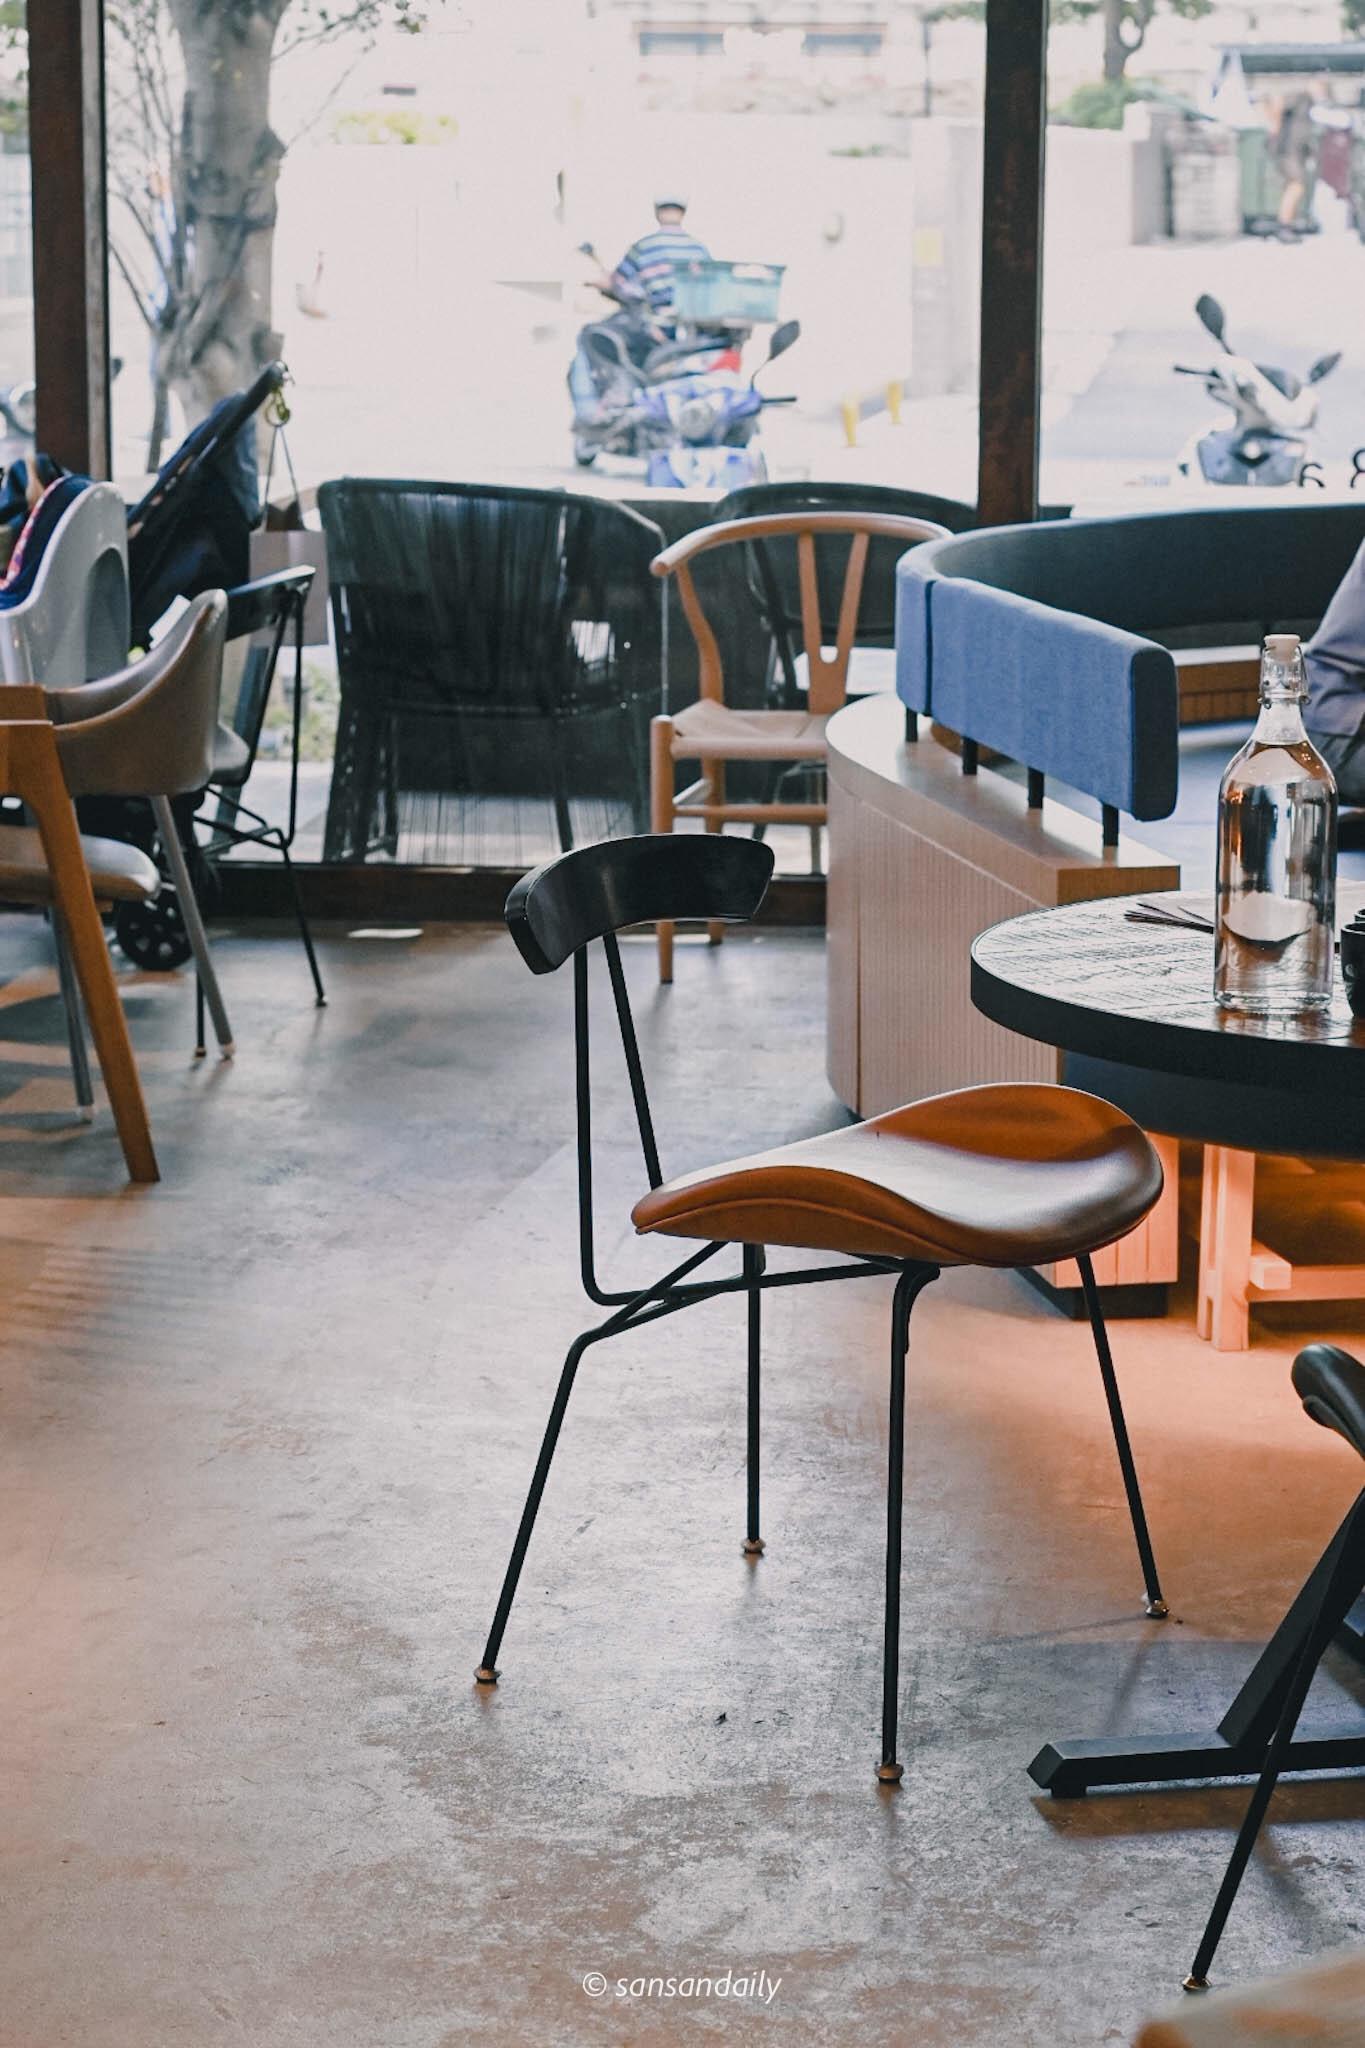 GUMGUM Beer & Wings雞翅酒吧內科店 設計師椅子特寫